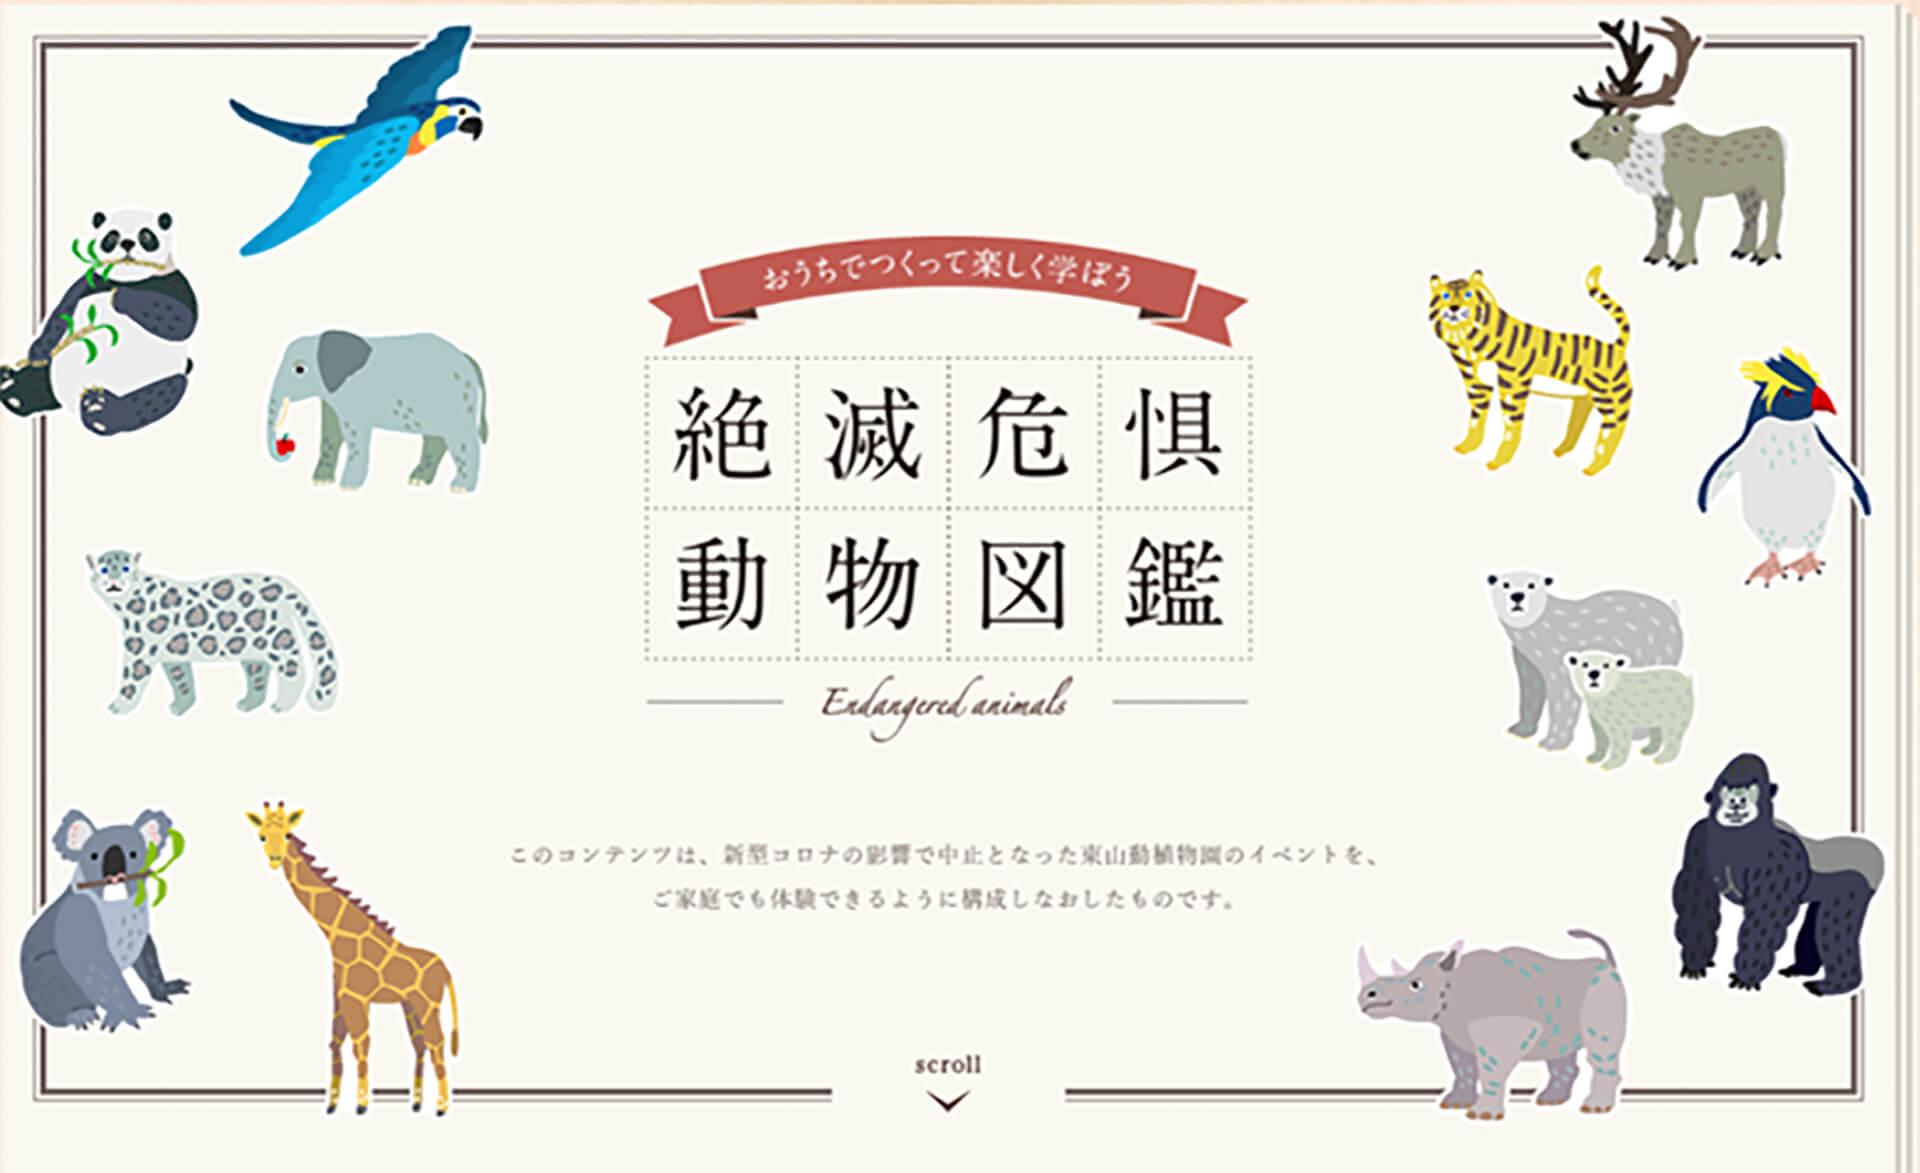 絶滅危惧動物図鑑・バナー